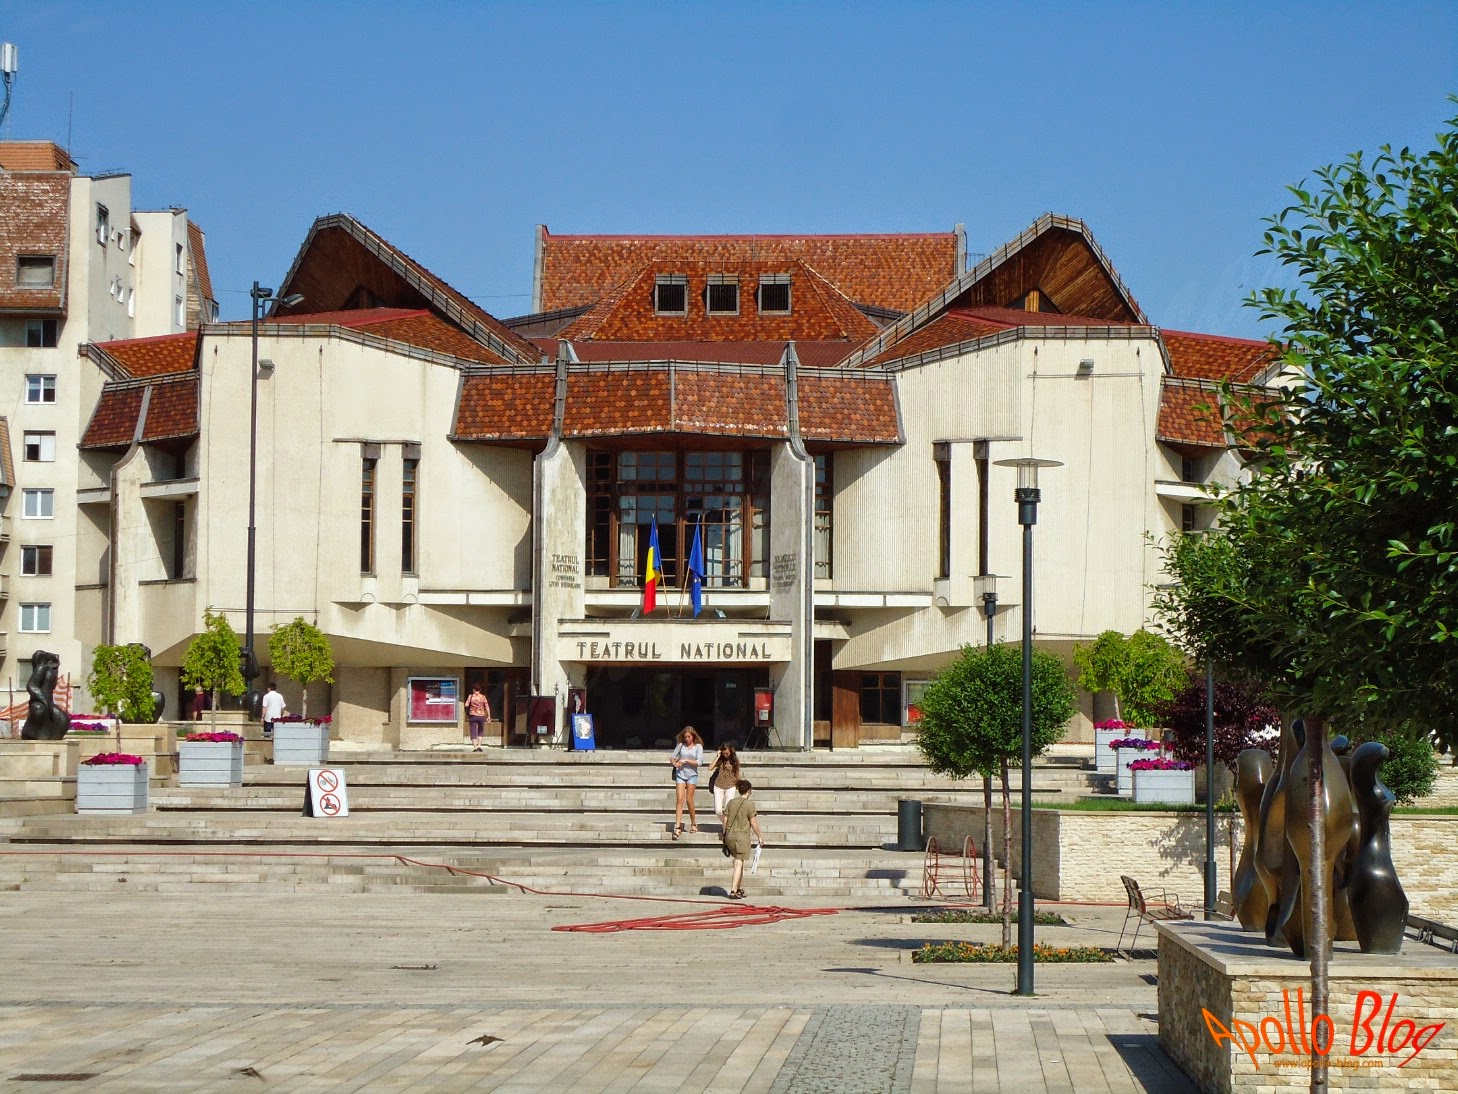 Teatrul National Mures